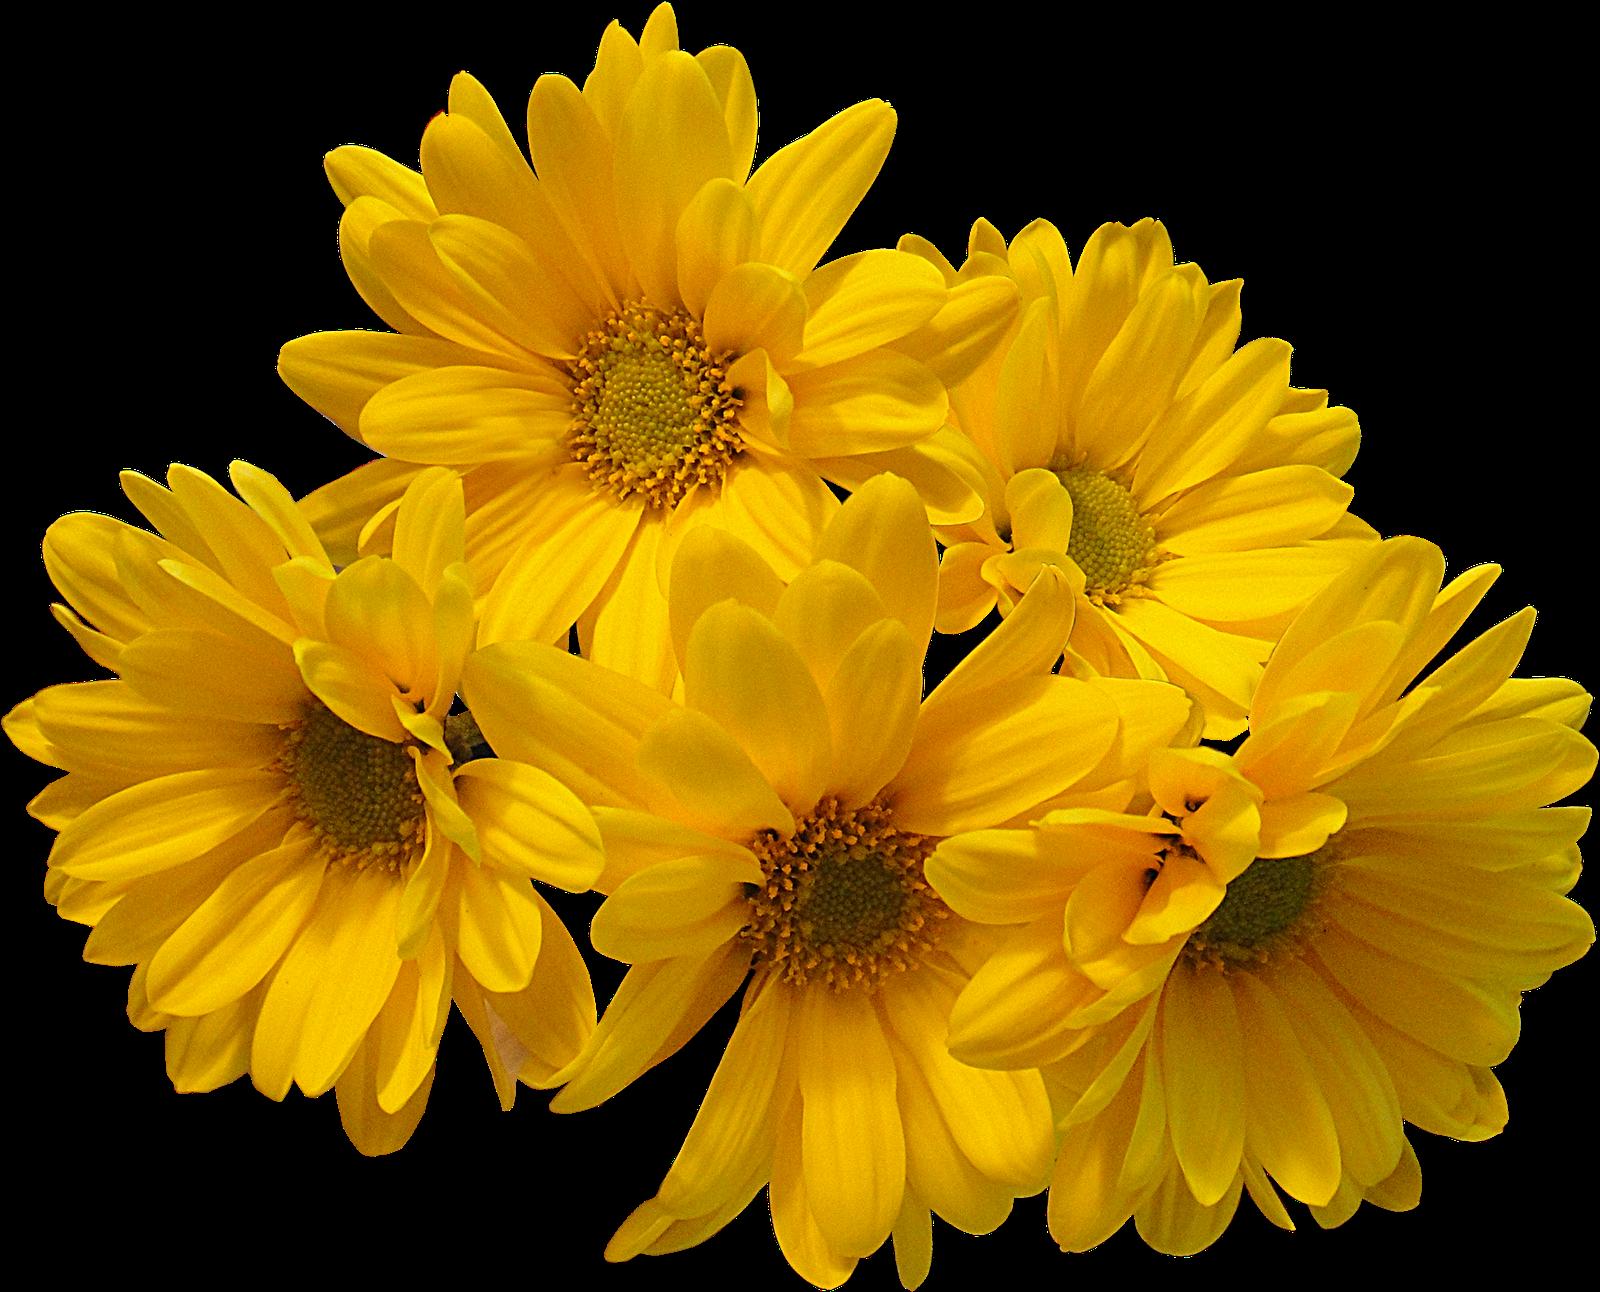 Download yellow flowers bouquet transparent image hq png image download png image yellow flowers bouquet transparent image 1700 mightylinksfo Gallery